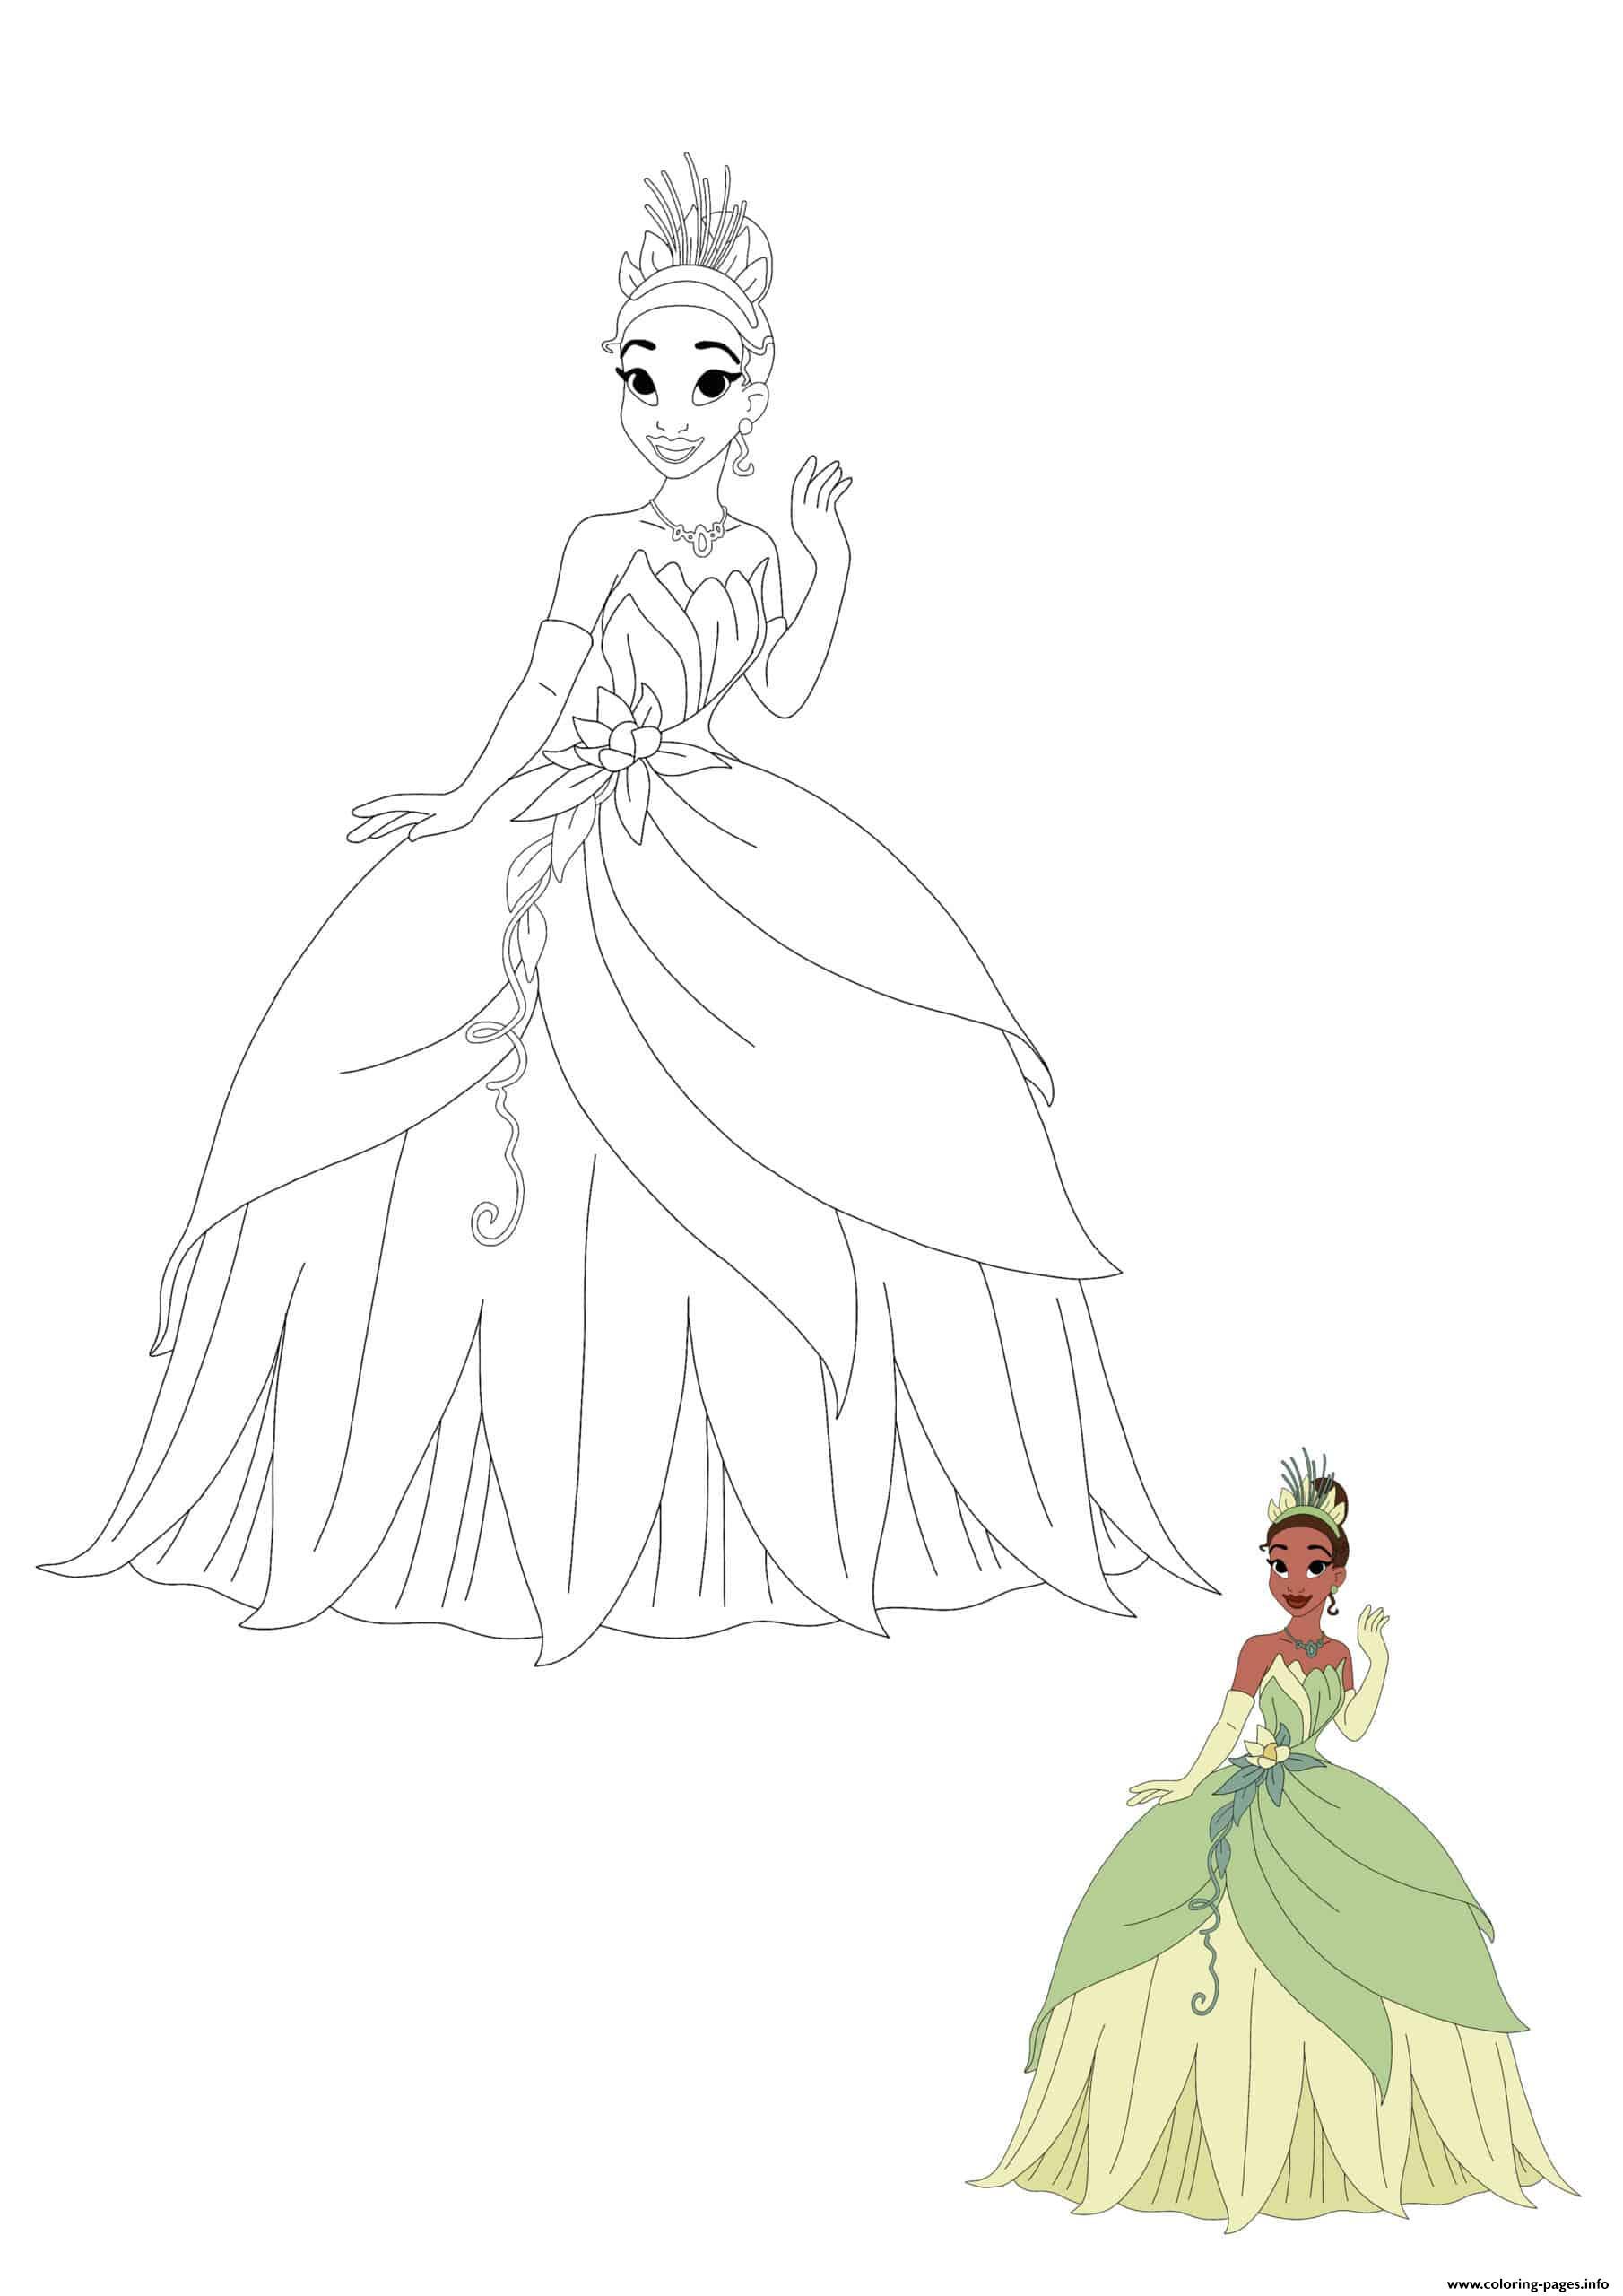 Princess Tiana Coloring Pages Printable